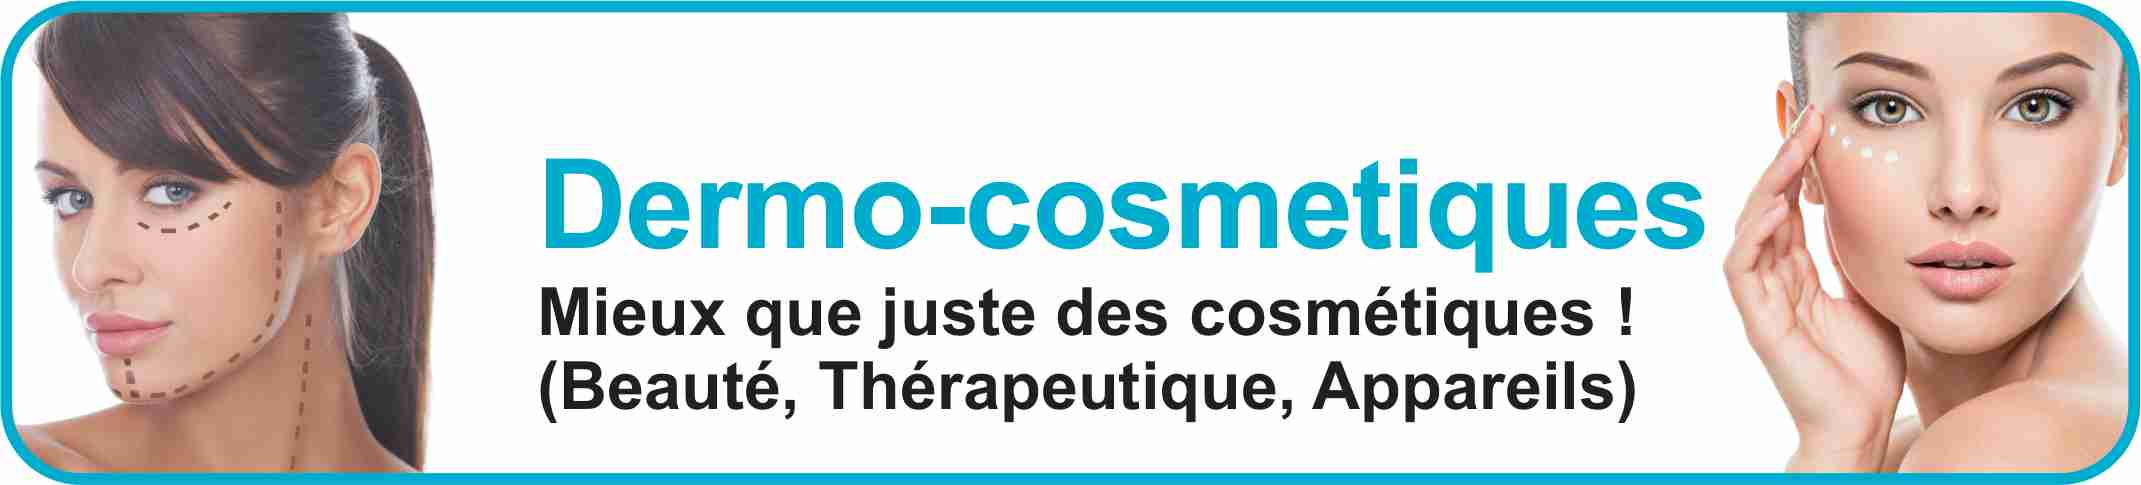 Dermo-cosmetiques